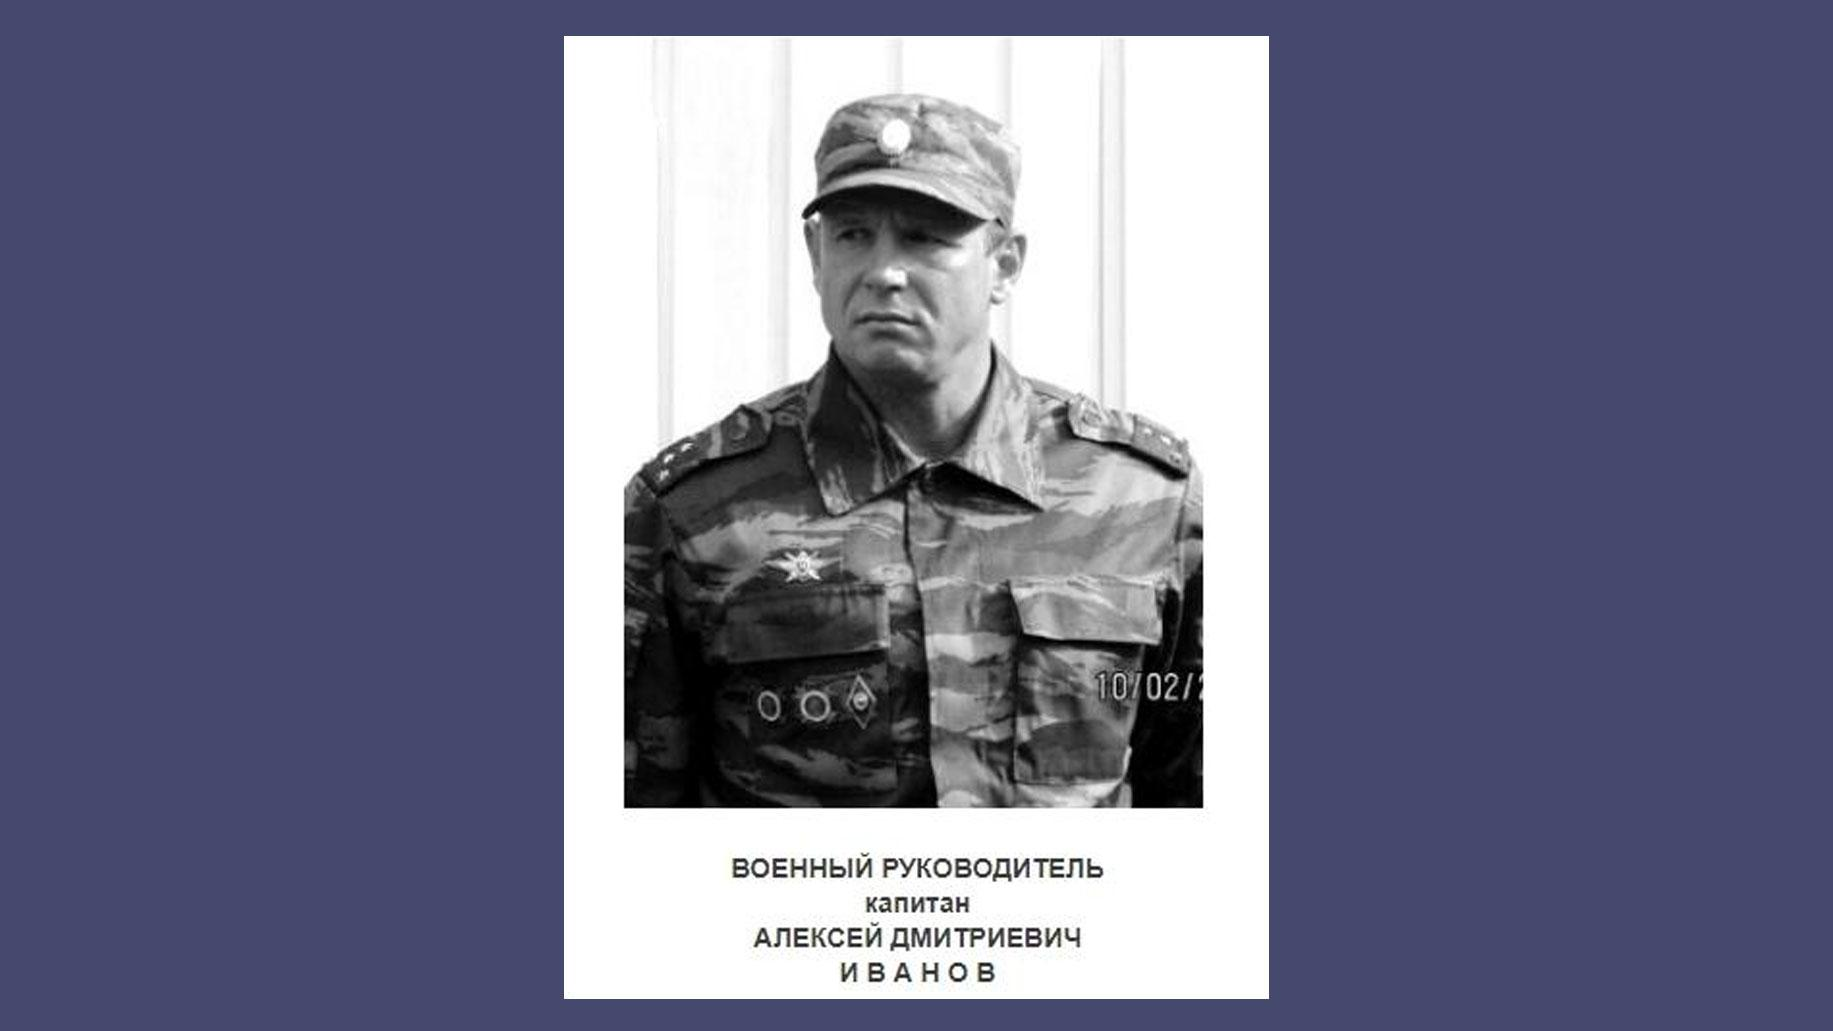 Фото© shkola-dpp.ru